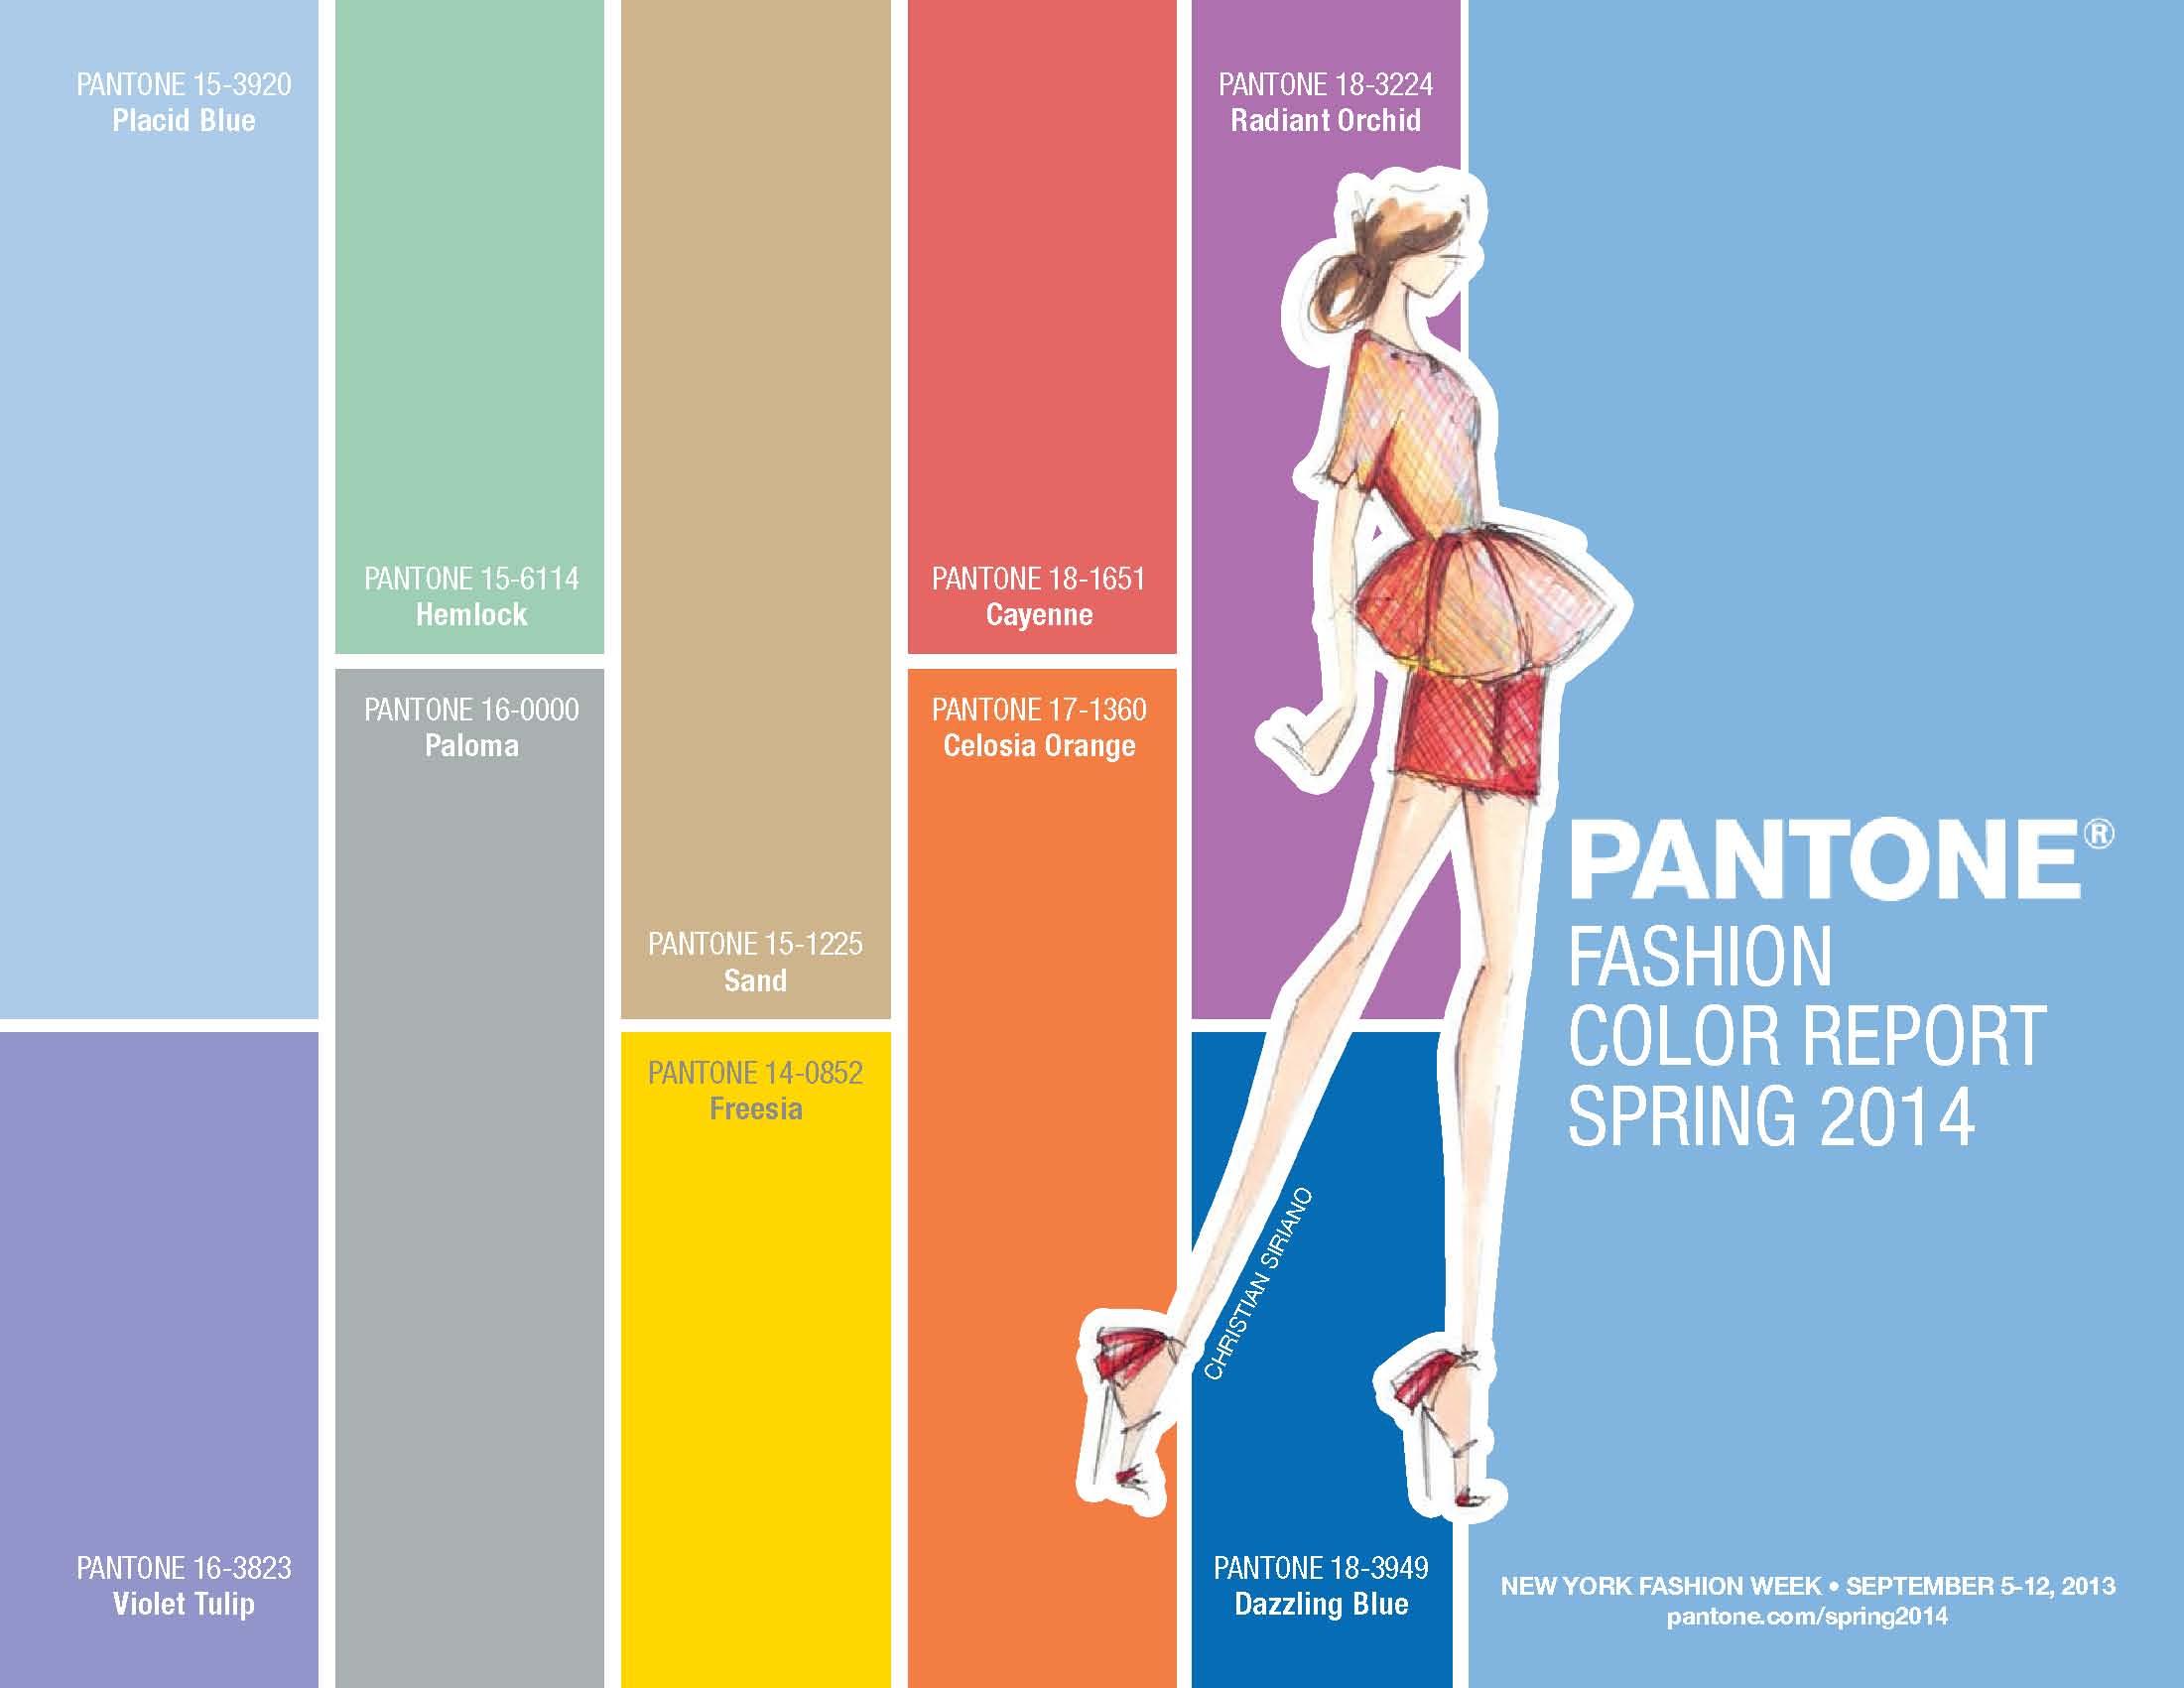 Pantone FCR Spring 2014 Final Page 021